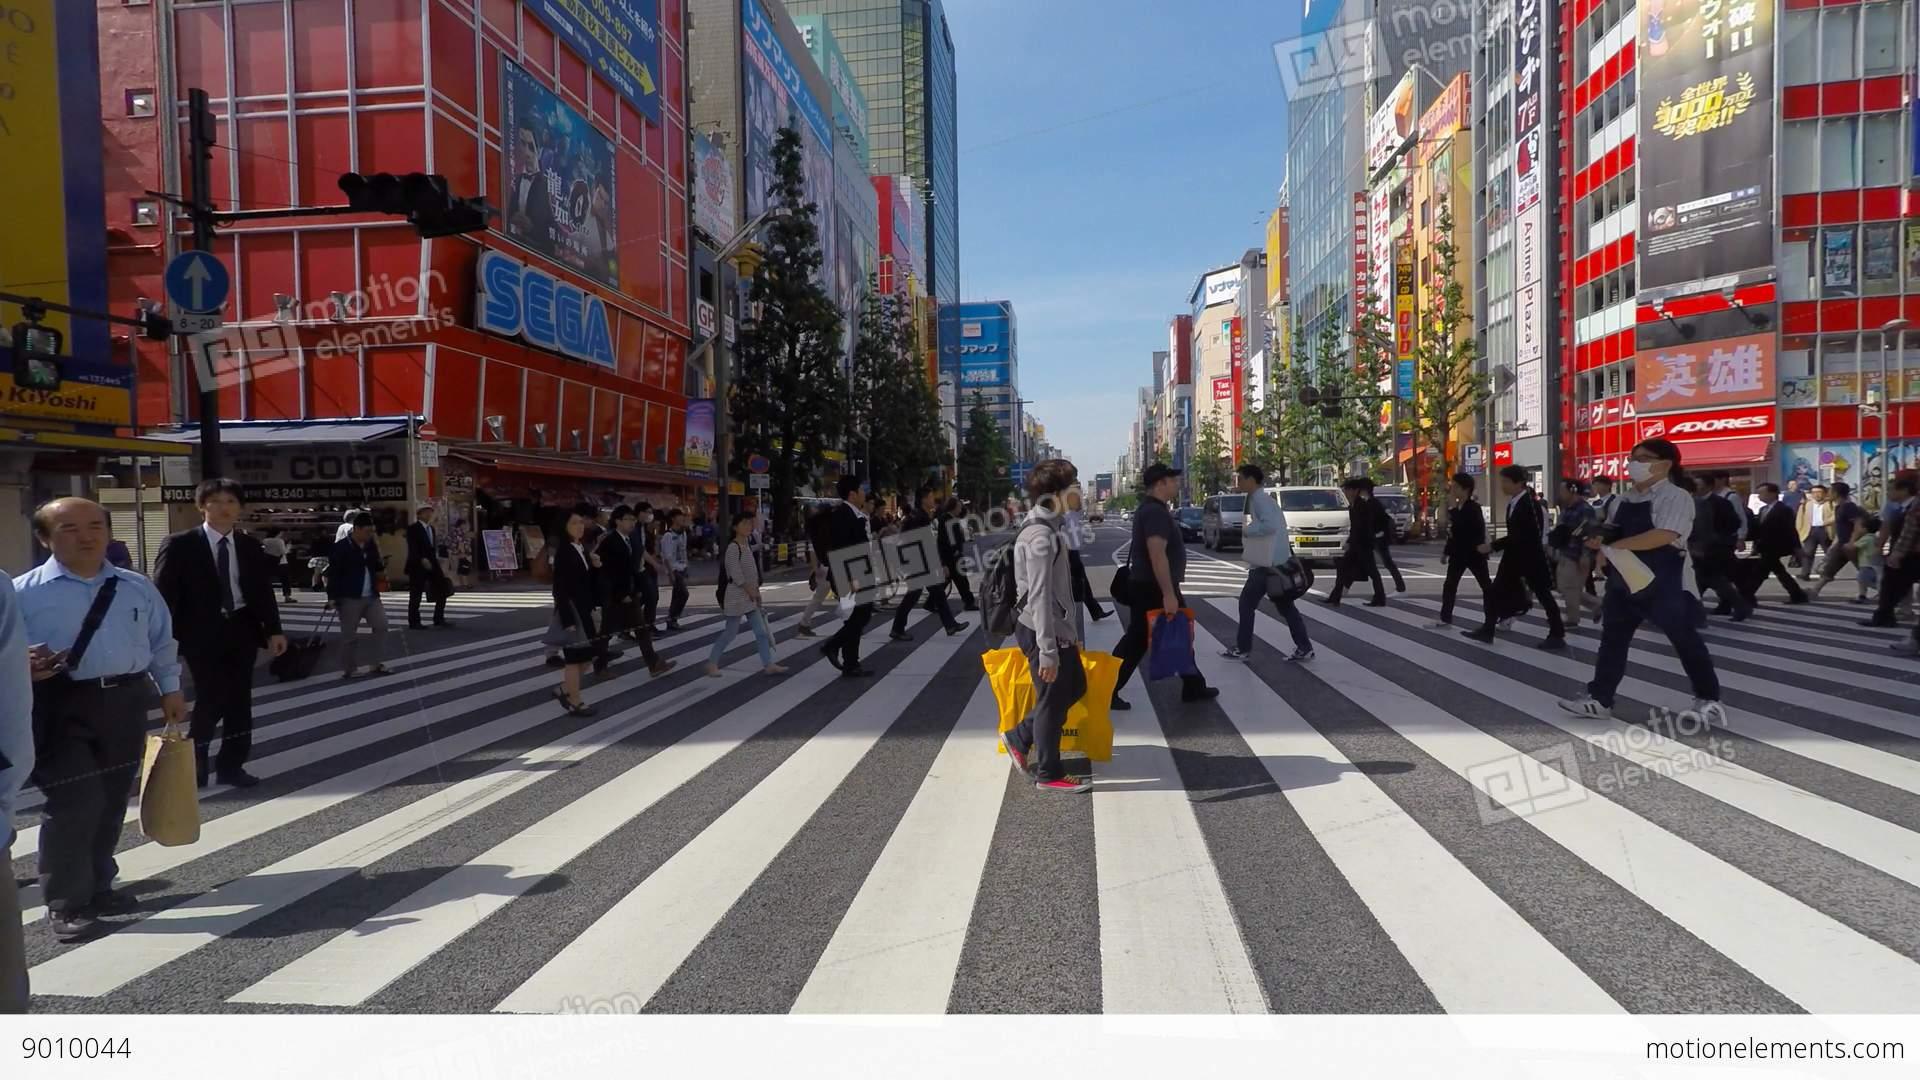 Retro Anime Girl Wallpaper Tokyo Japan People Crossing The Street At Tokyo S